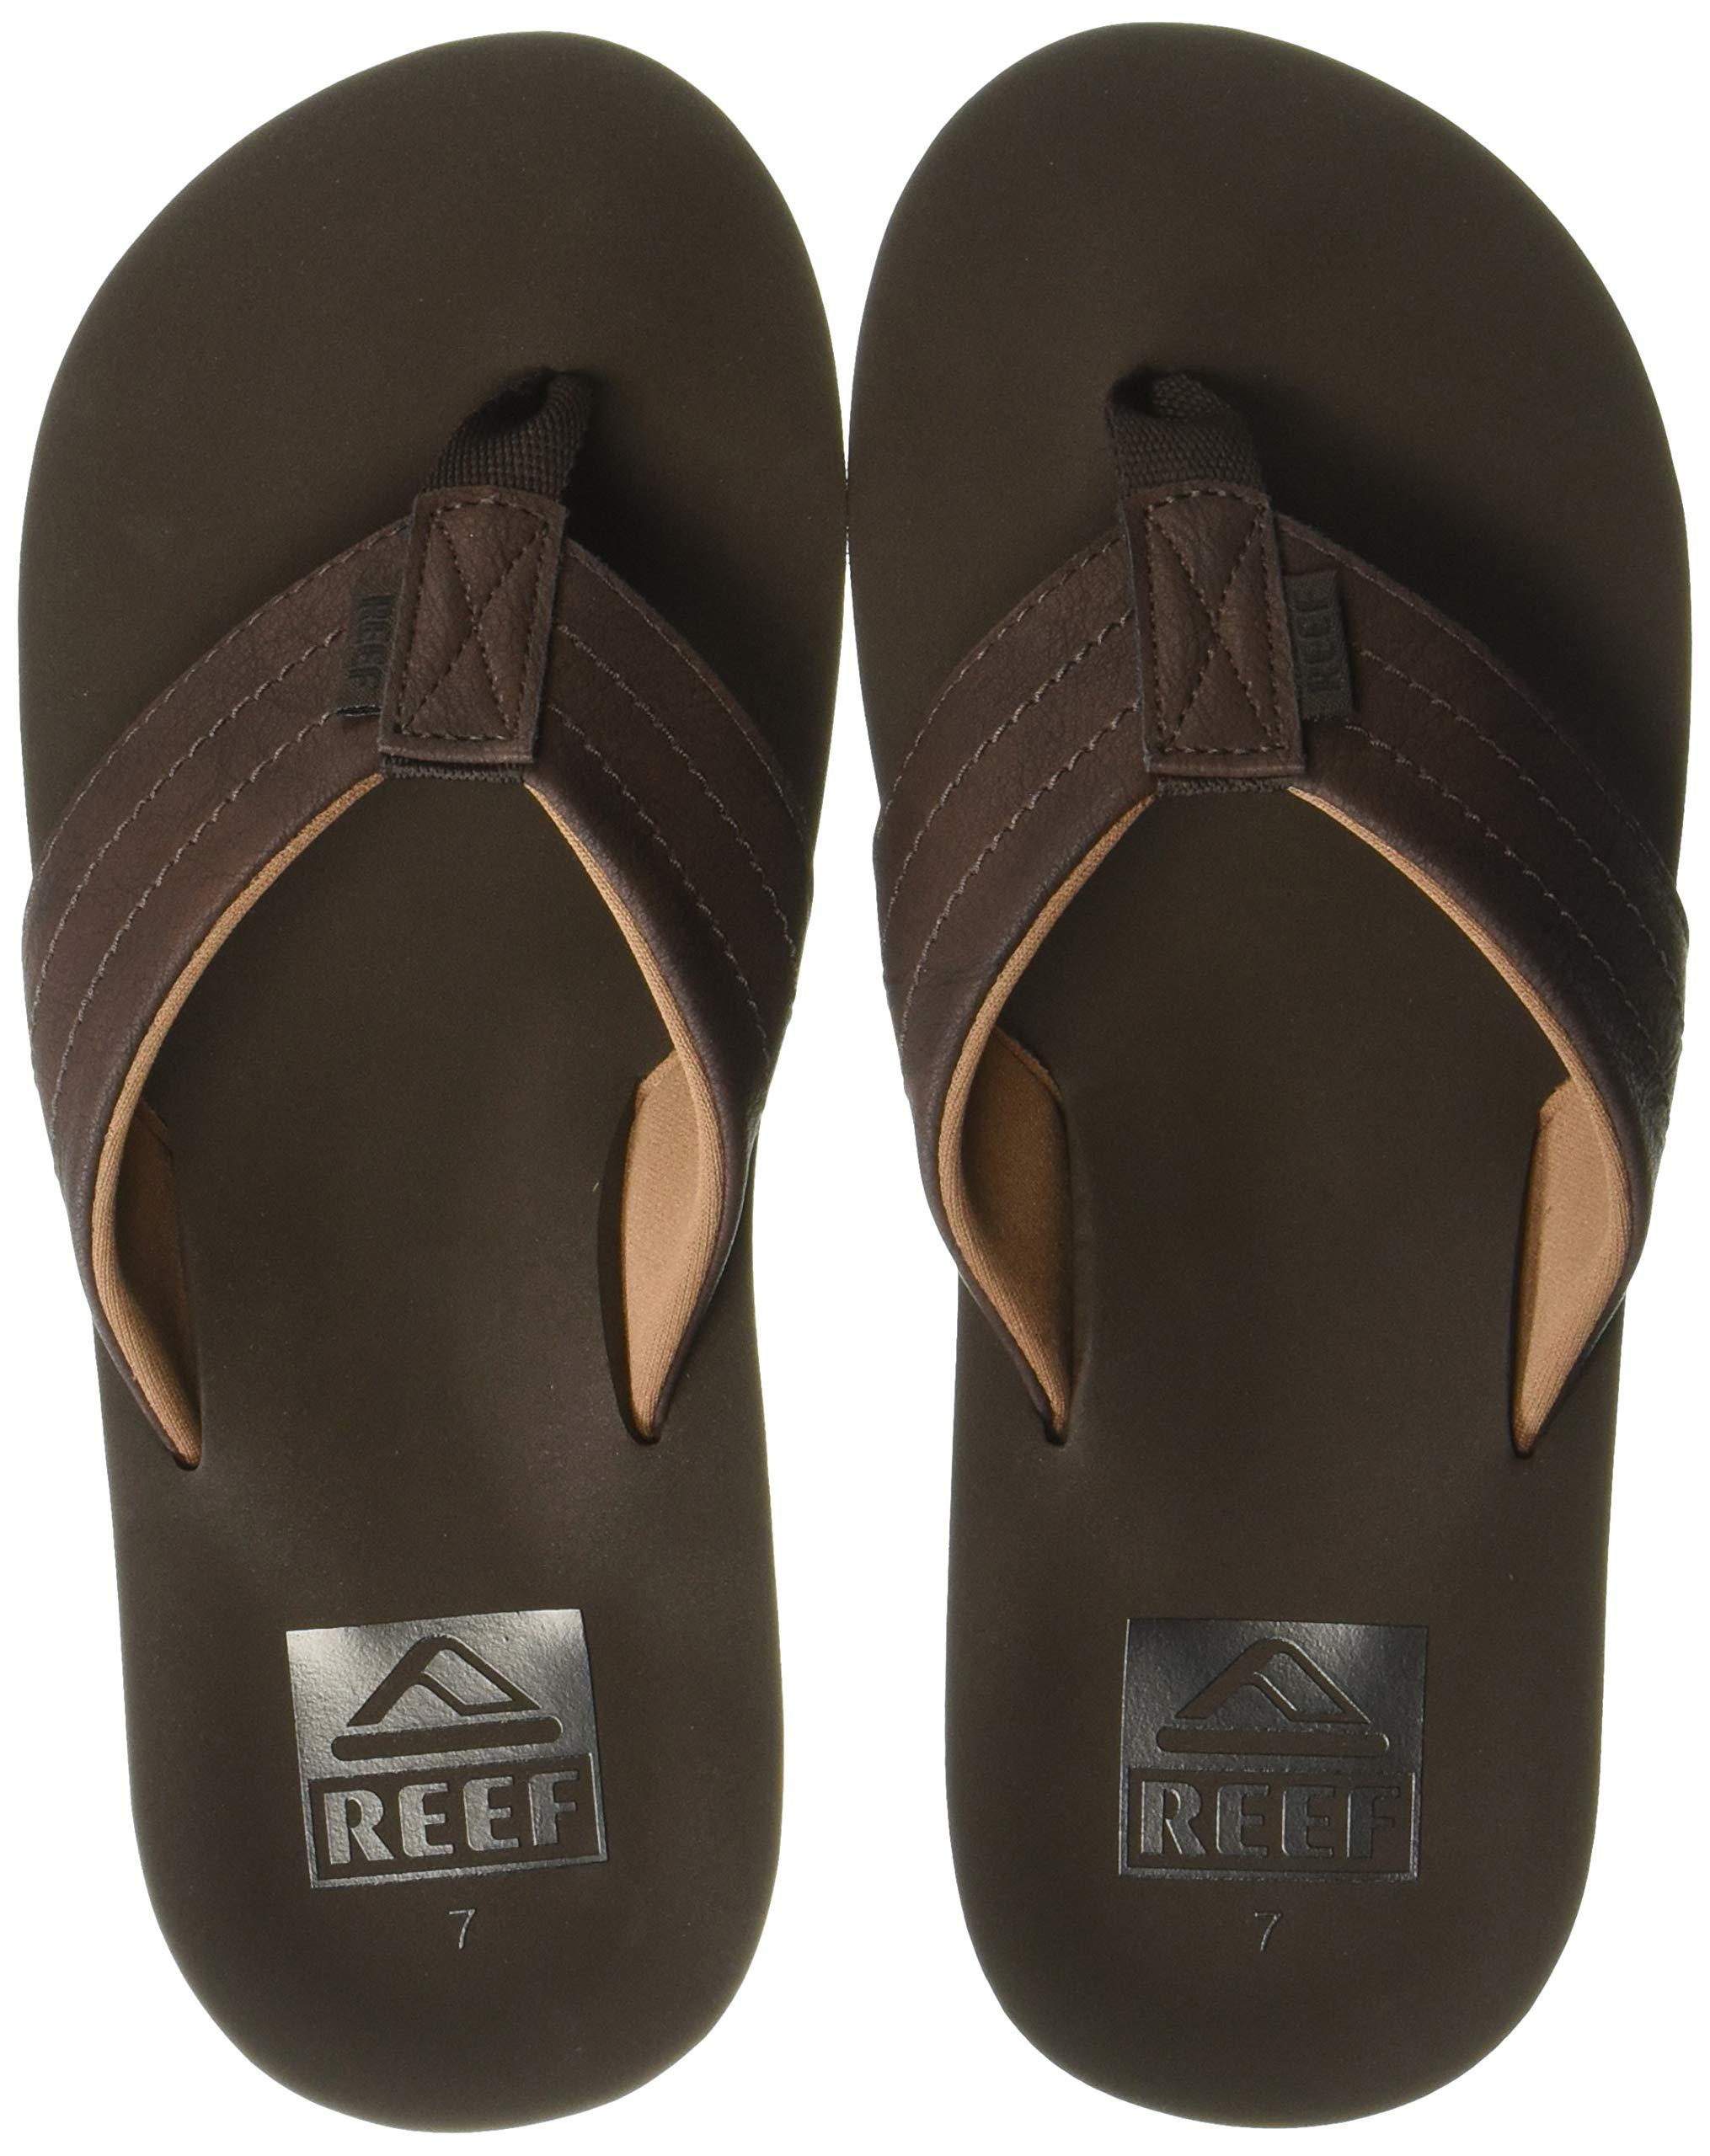 Reef Men's TWINPIN LUX Sandal, Brown, 080 M US